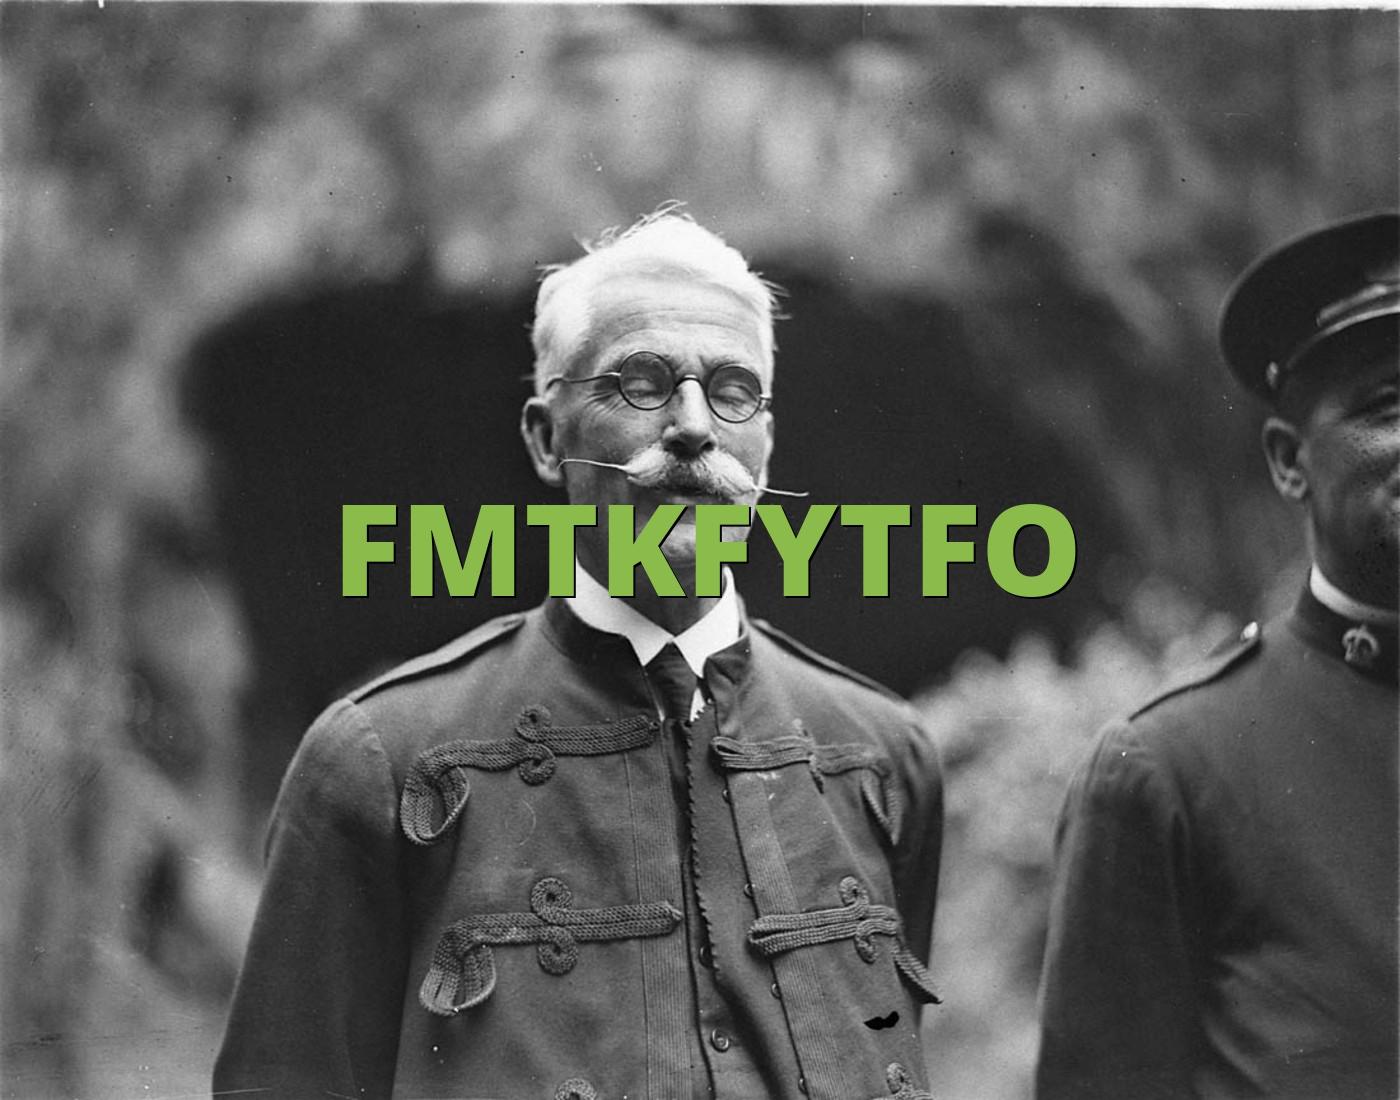 FMTKFYTFO